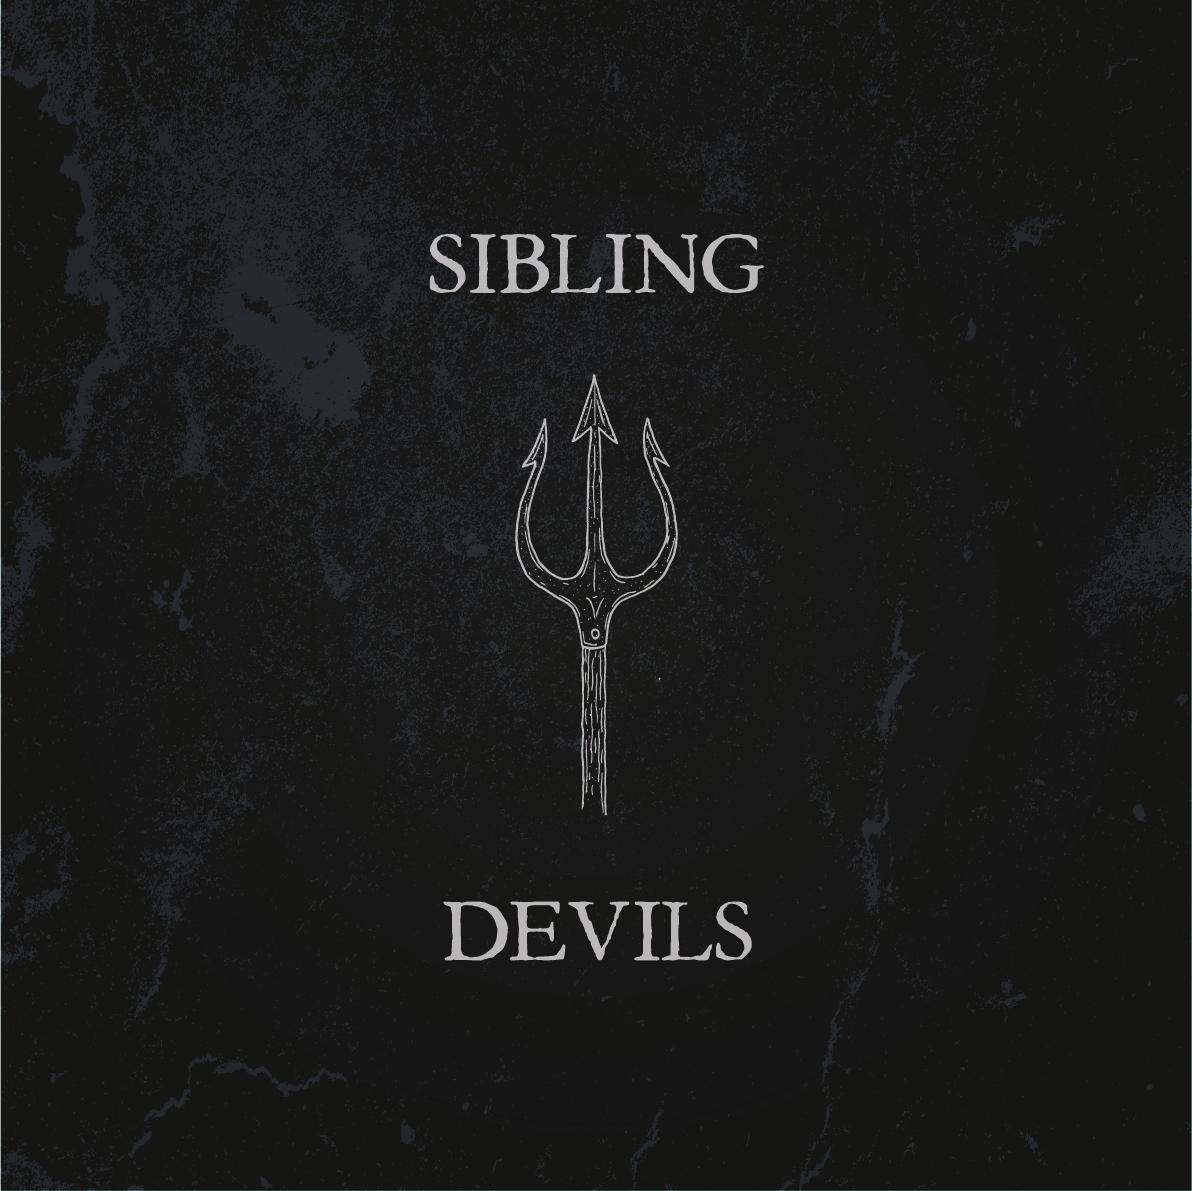 Sibling-cover-mk2-06.png